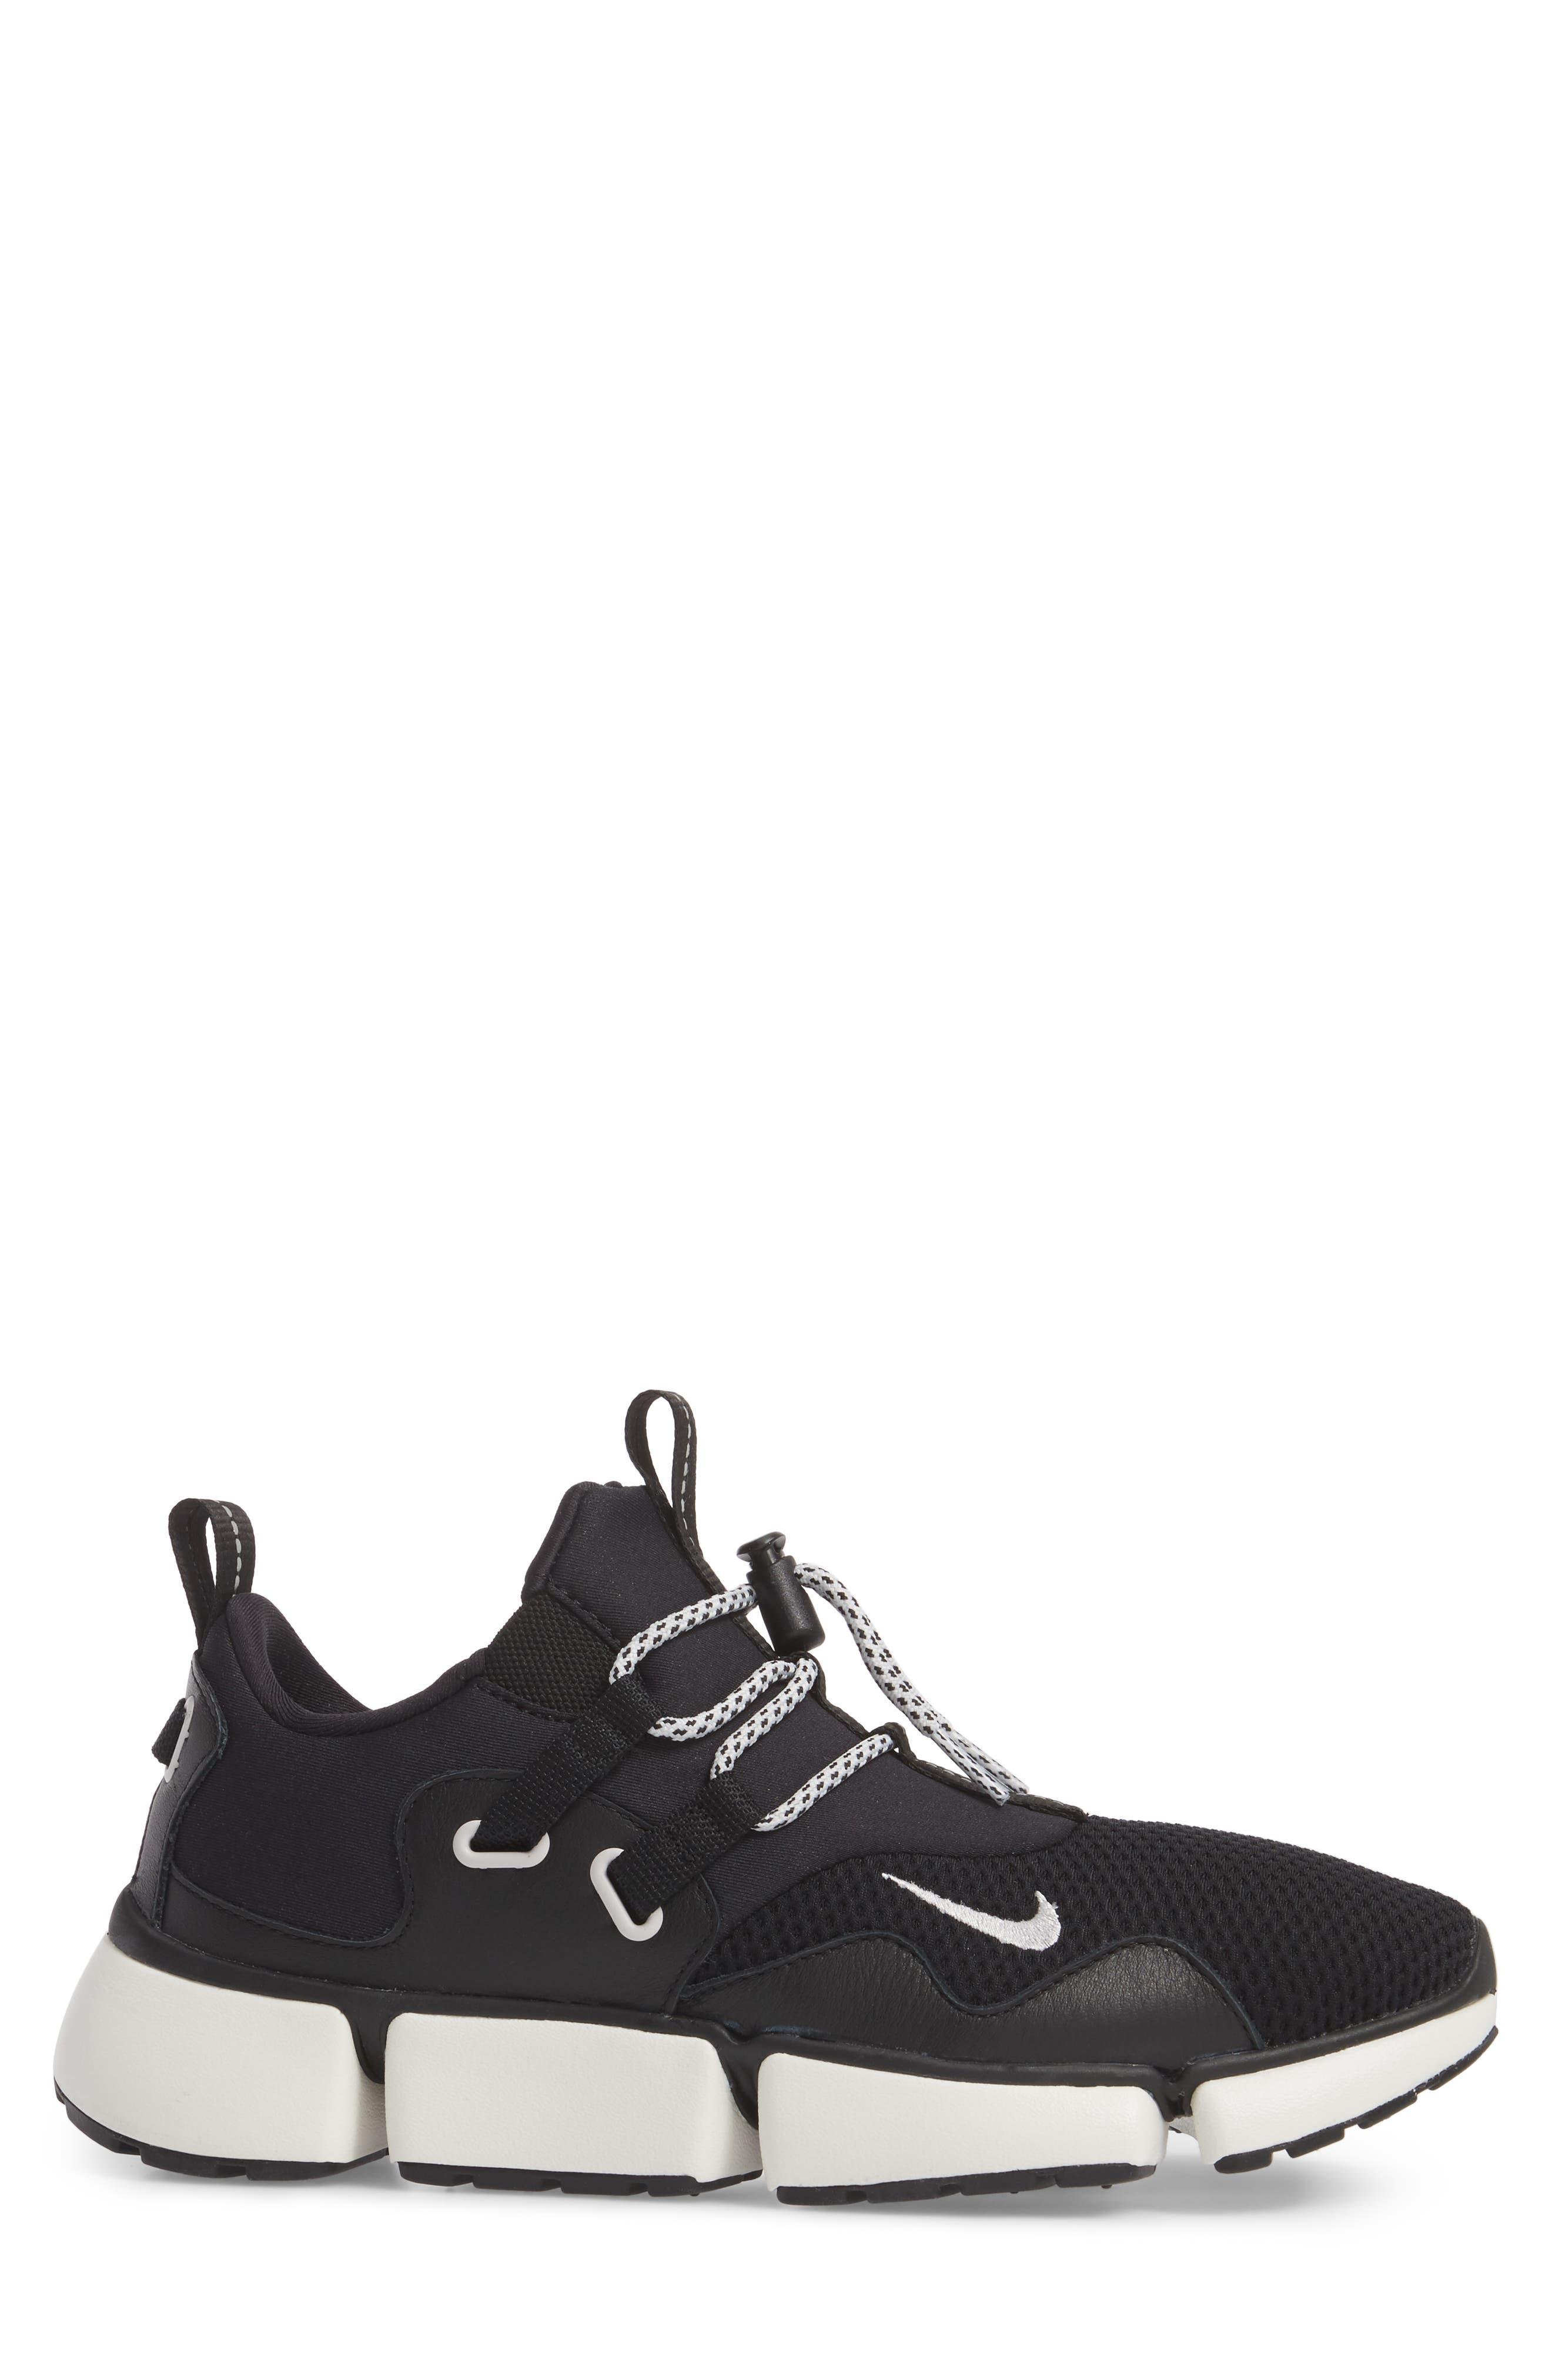 Pocket Knife DM Sneaker,                             Alternate thumbnail 3, color,                             Black/ Vast Grey/ Sail